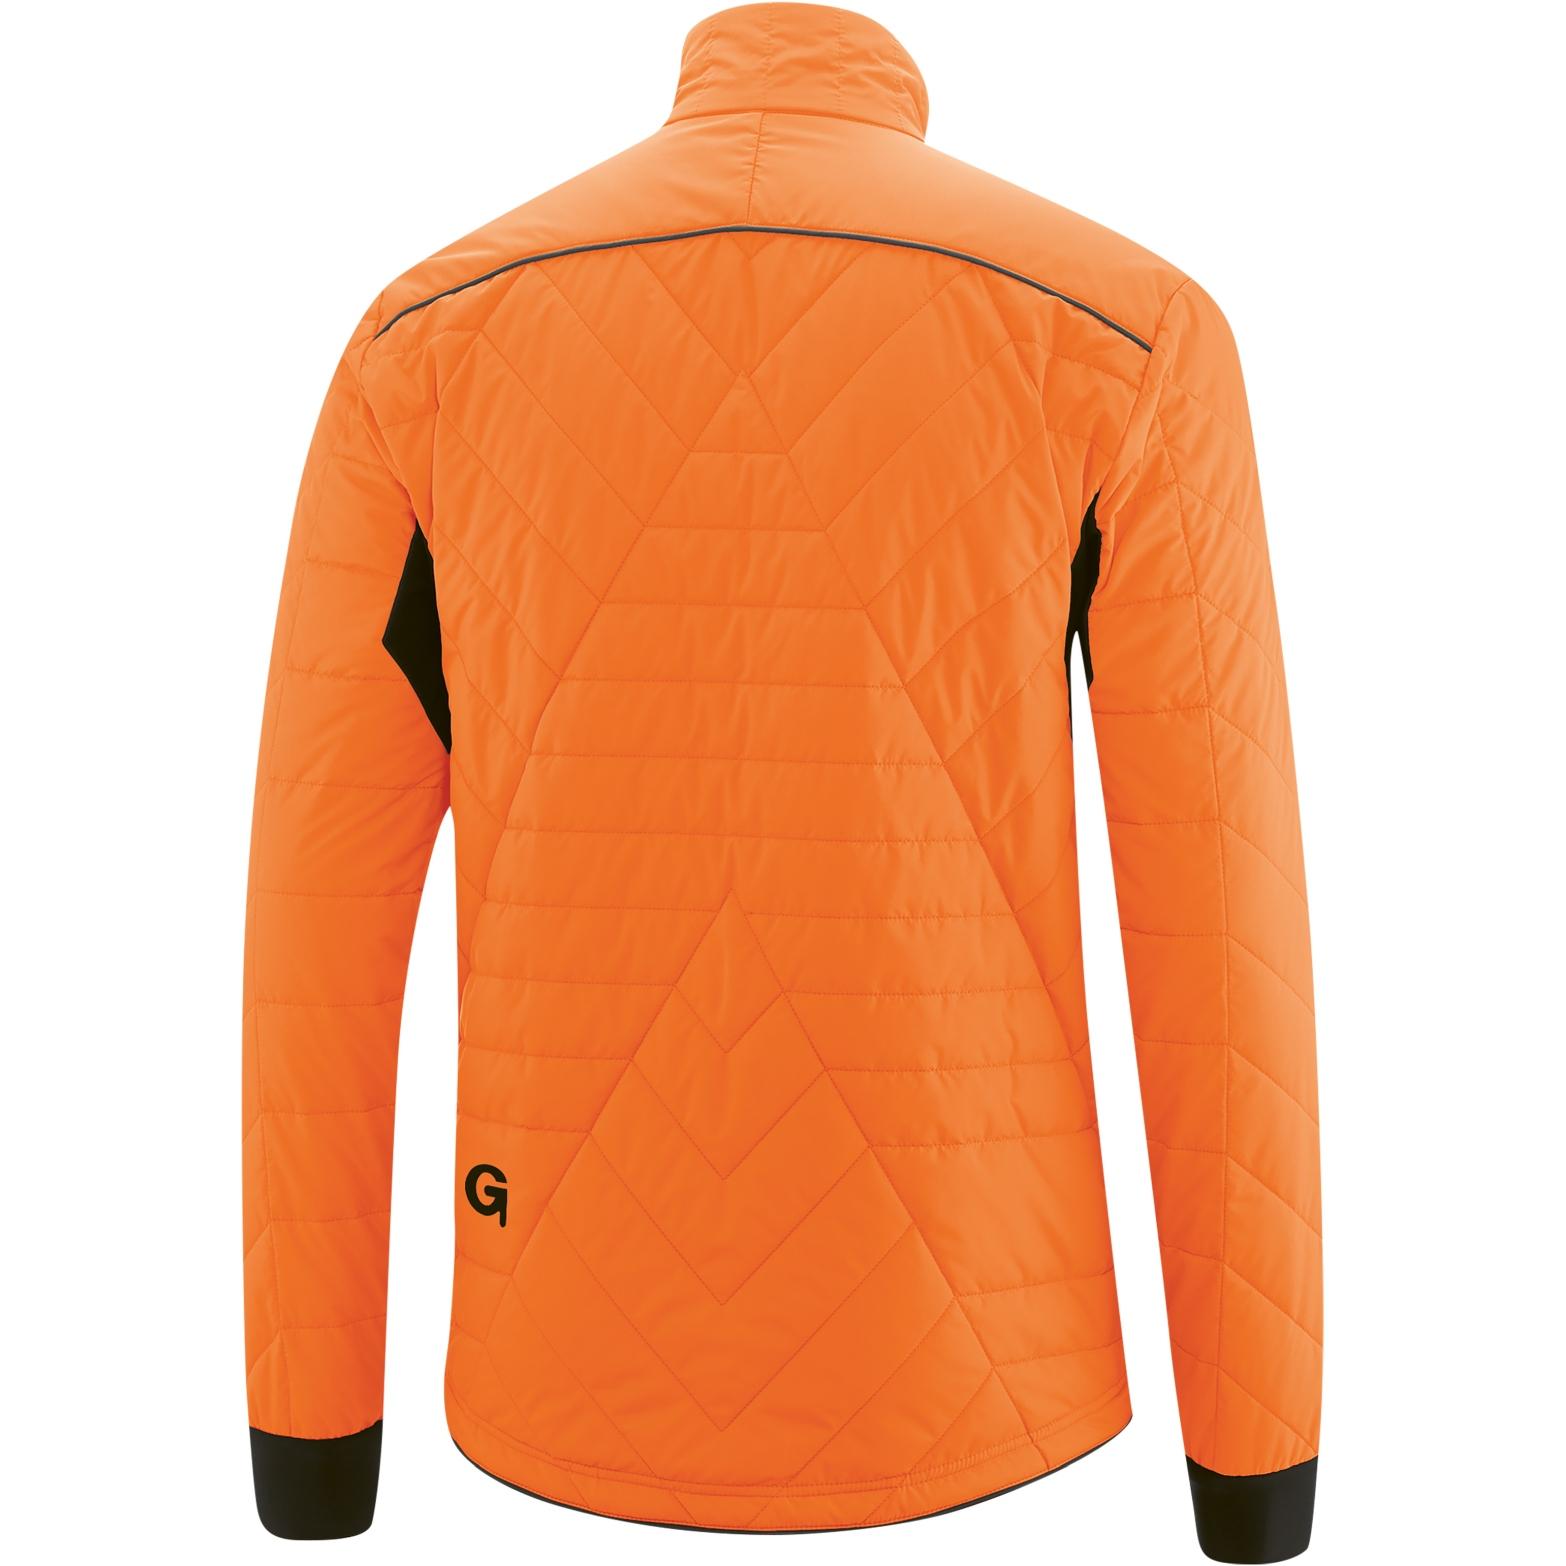 Image of Gonso Mula Men's Primaloft Commuter Jacket - Red Orange